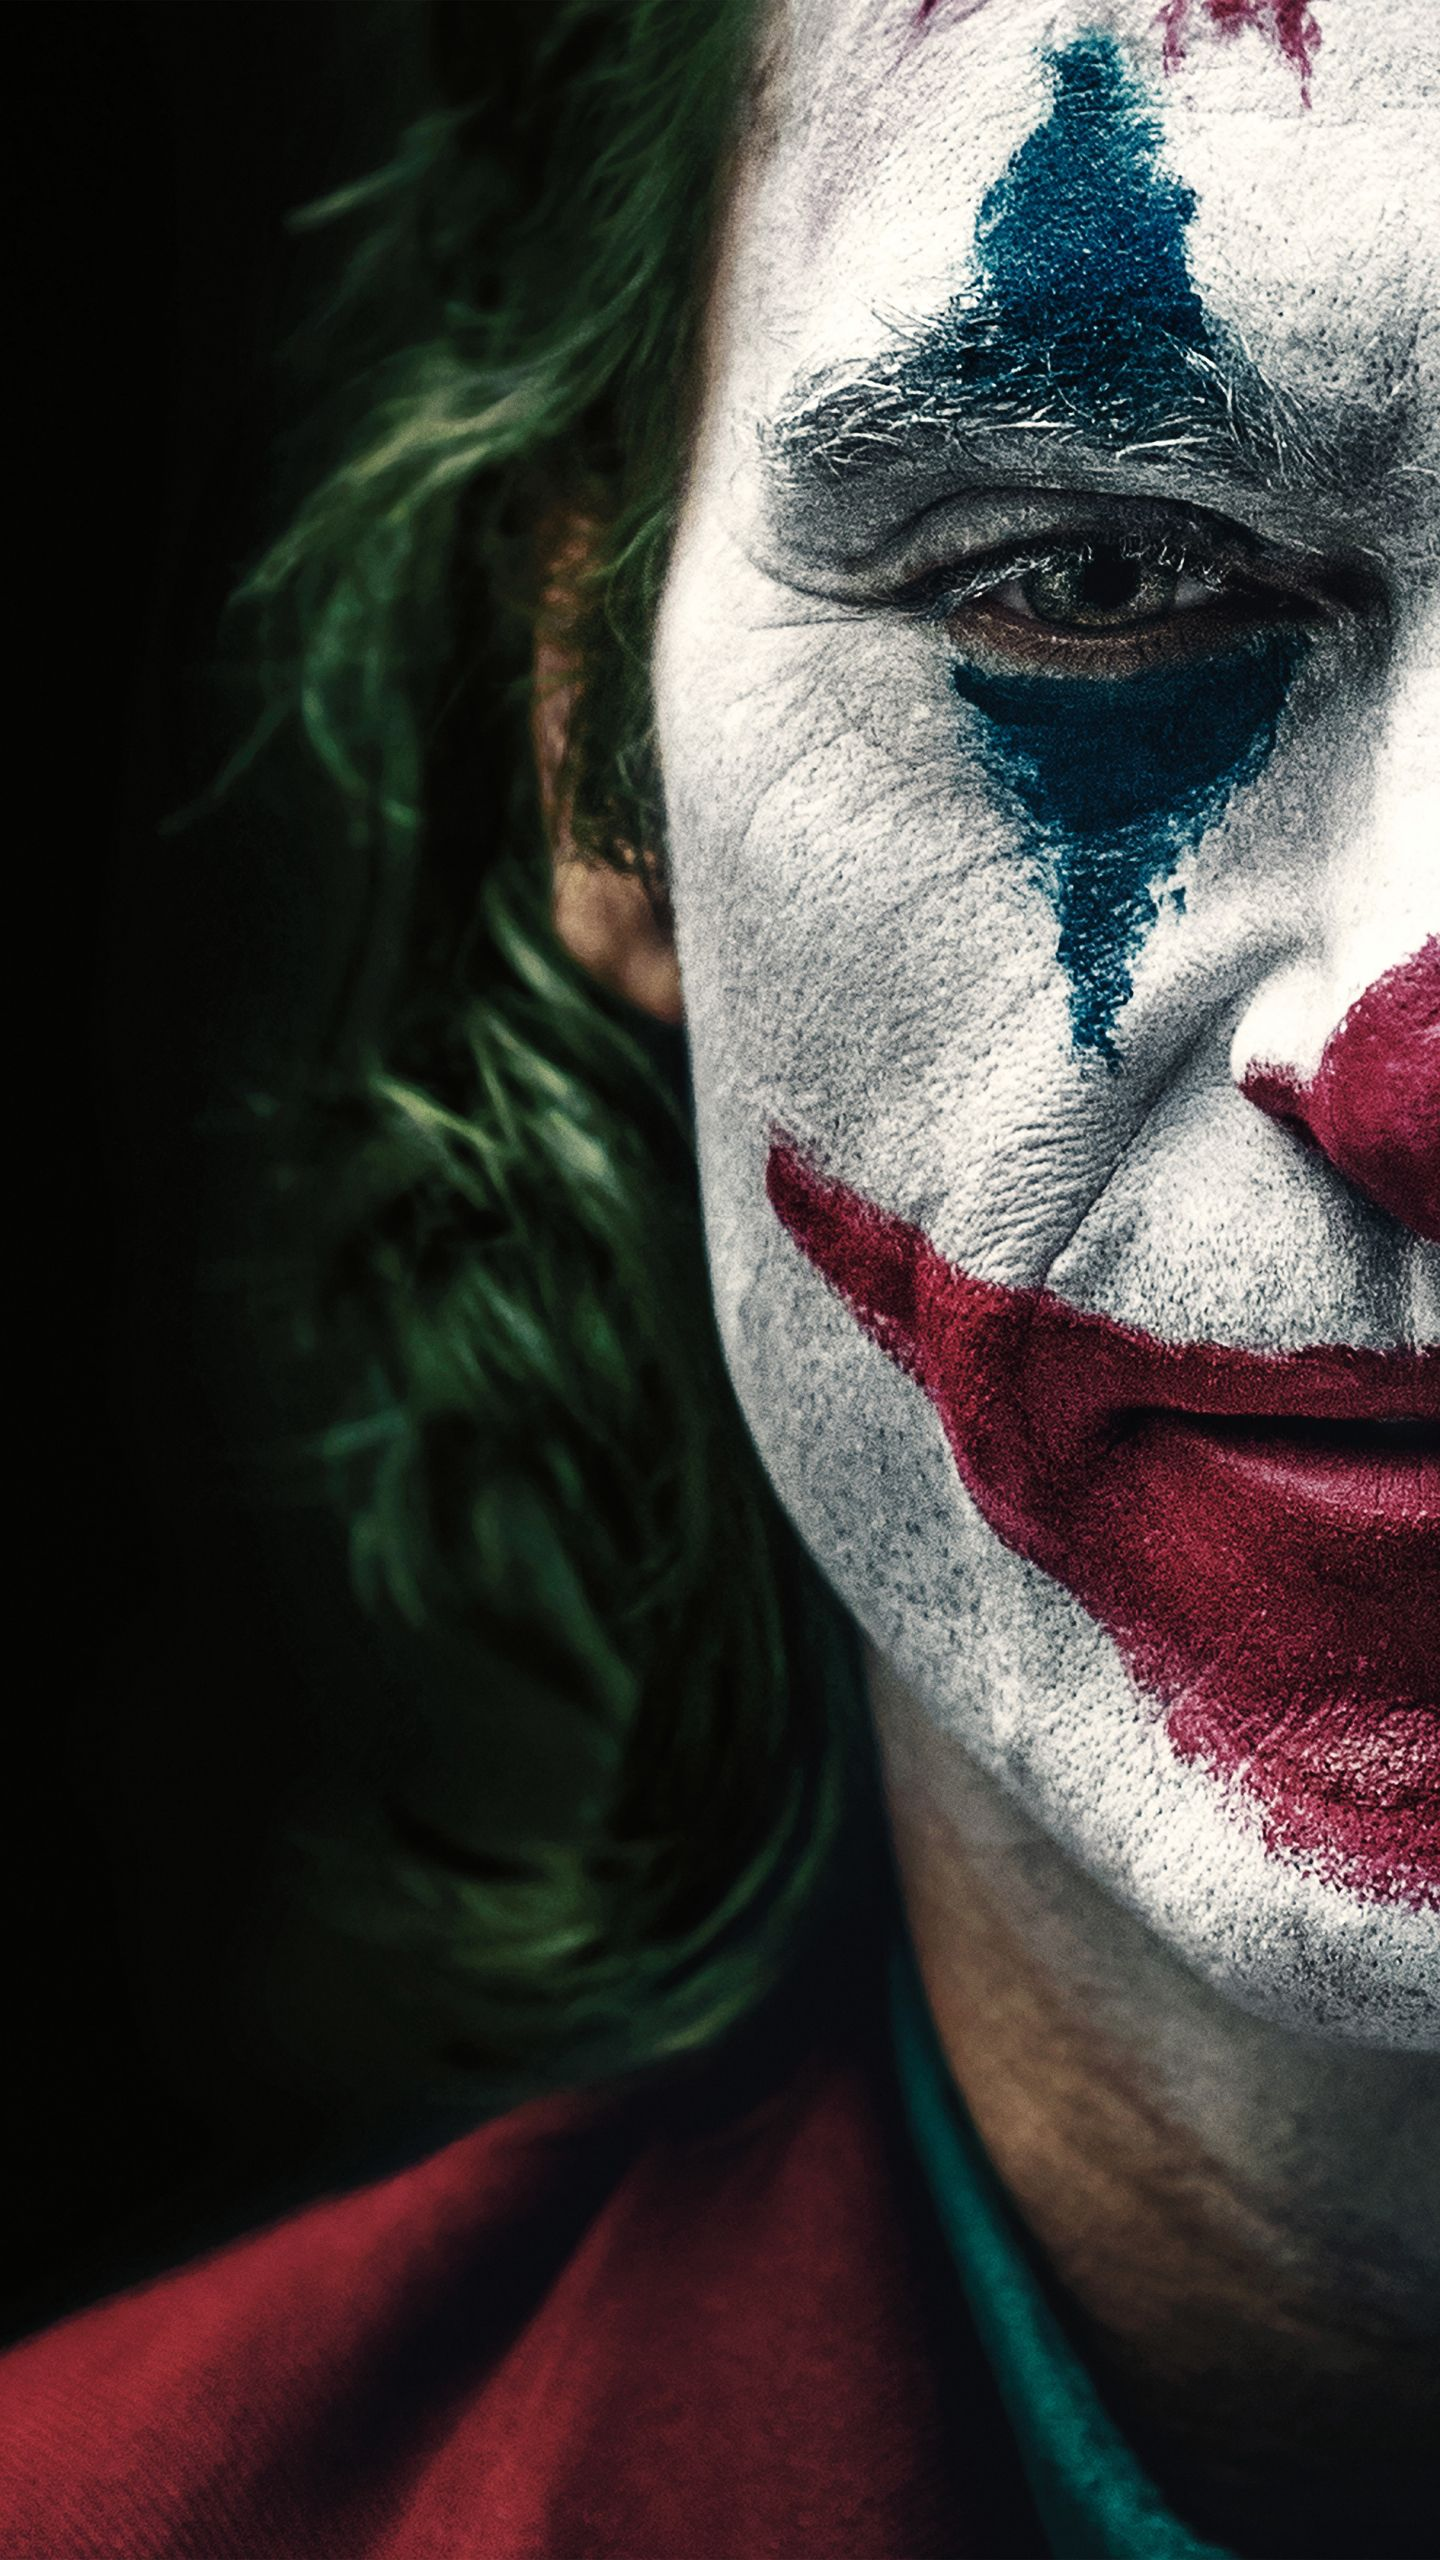 Joker Movie Wallpaper Joker wallpapers, Joker iphone